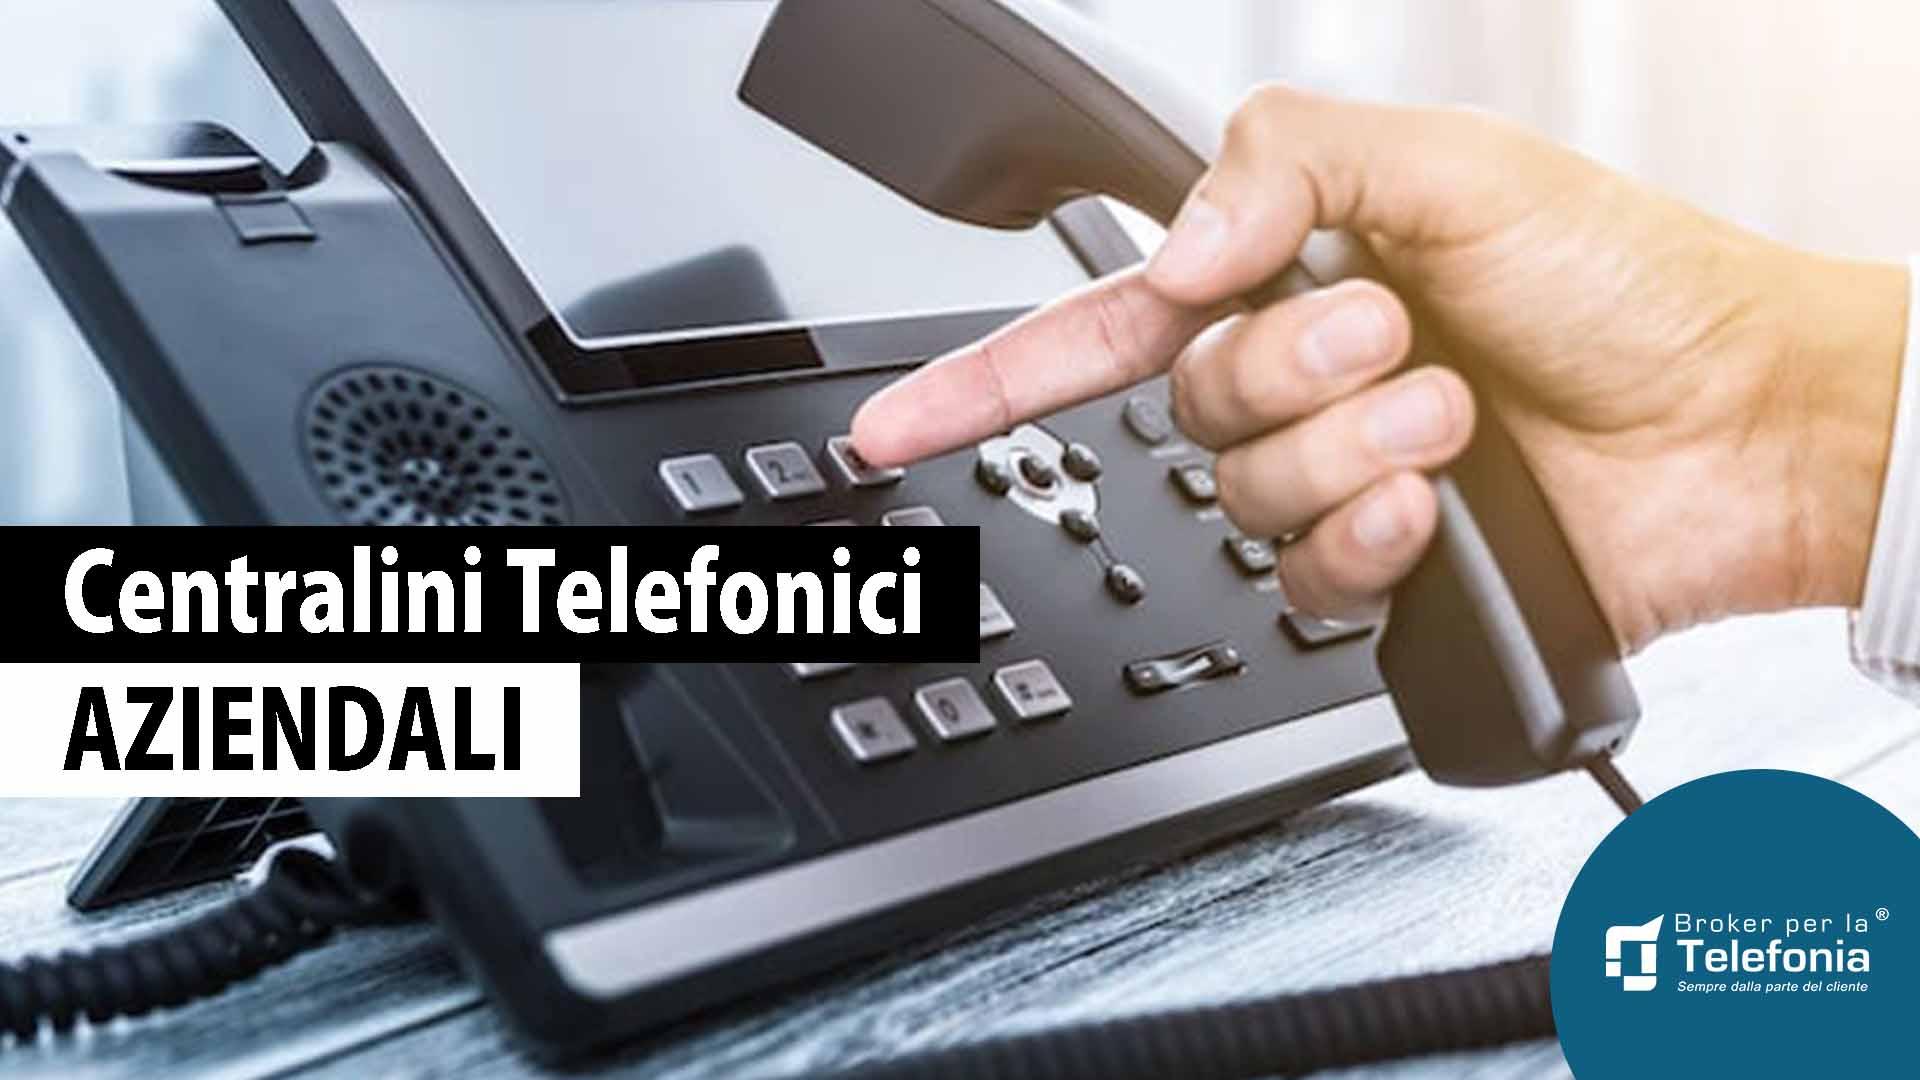 centralini telefonici aziendali